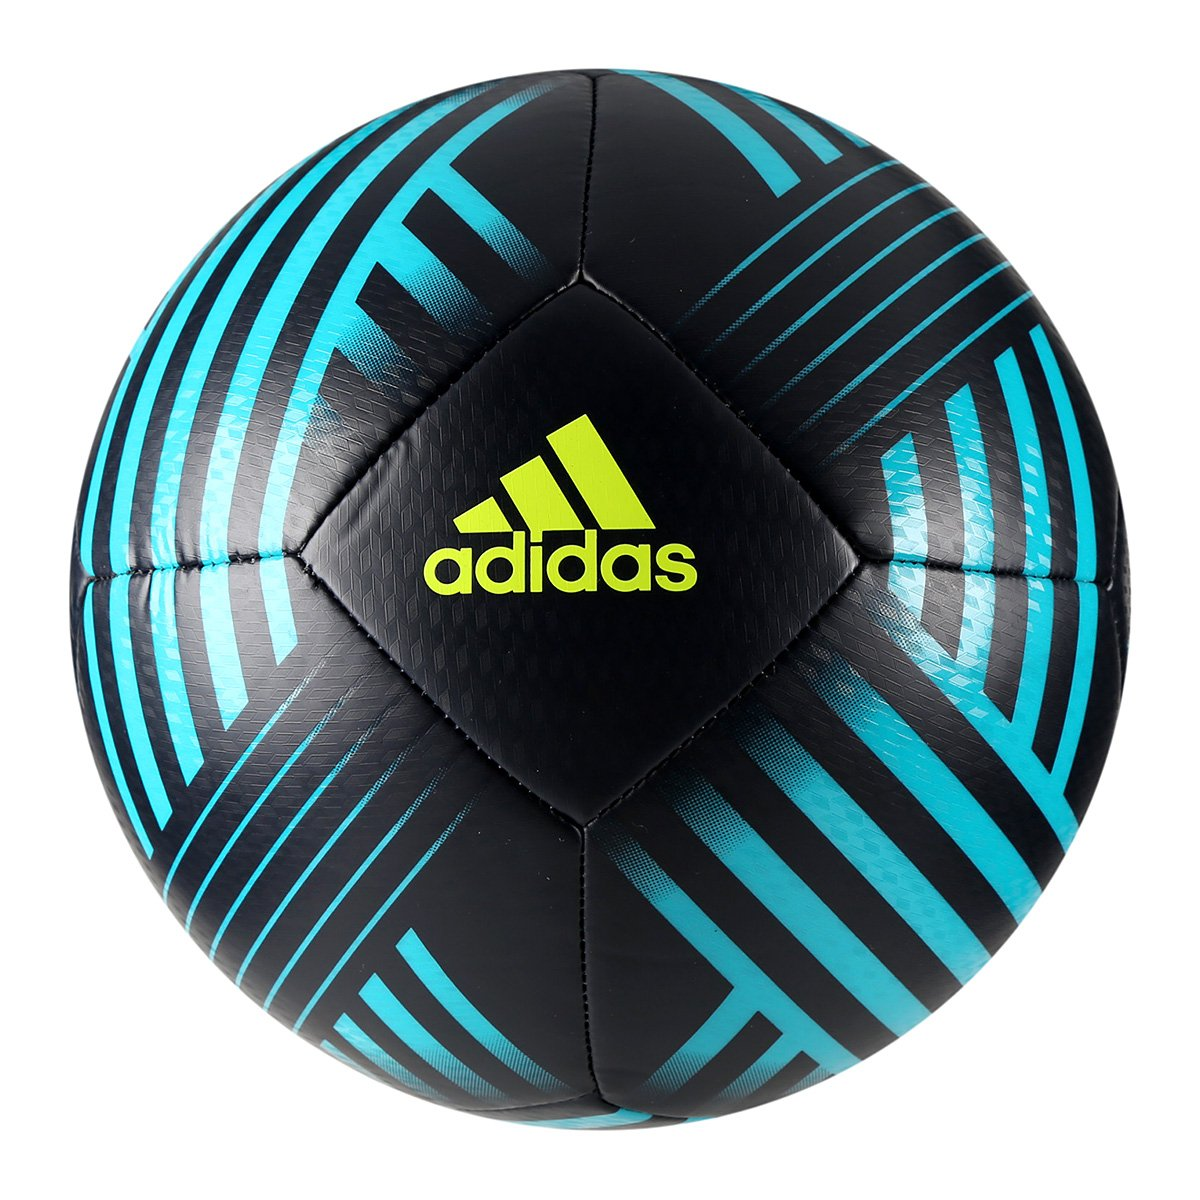 Bola Futebol Campo Adidas Nemeziz Glider - Compre Agora  60cb8ad9dd33b